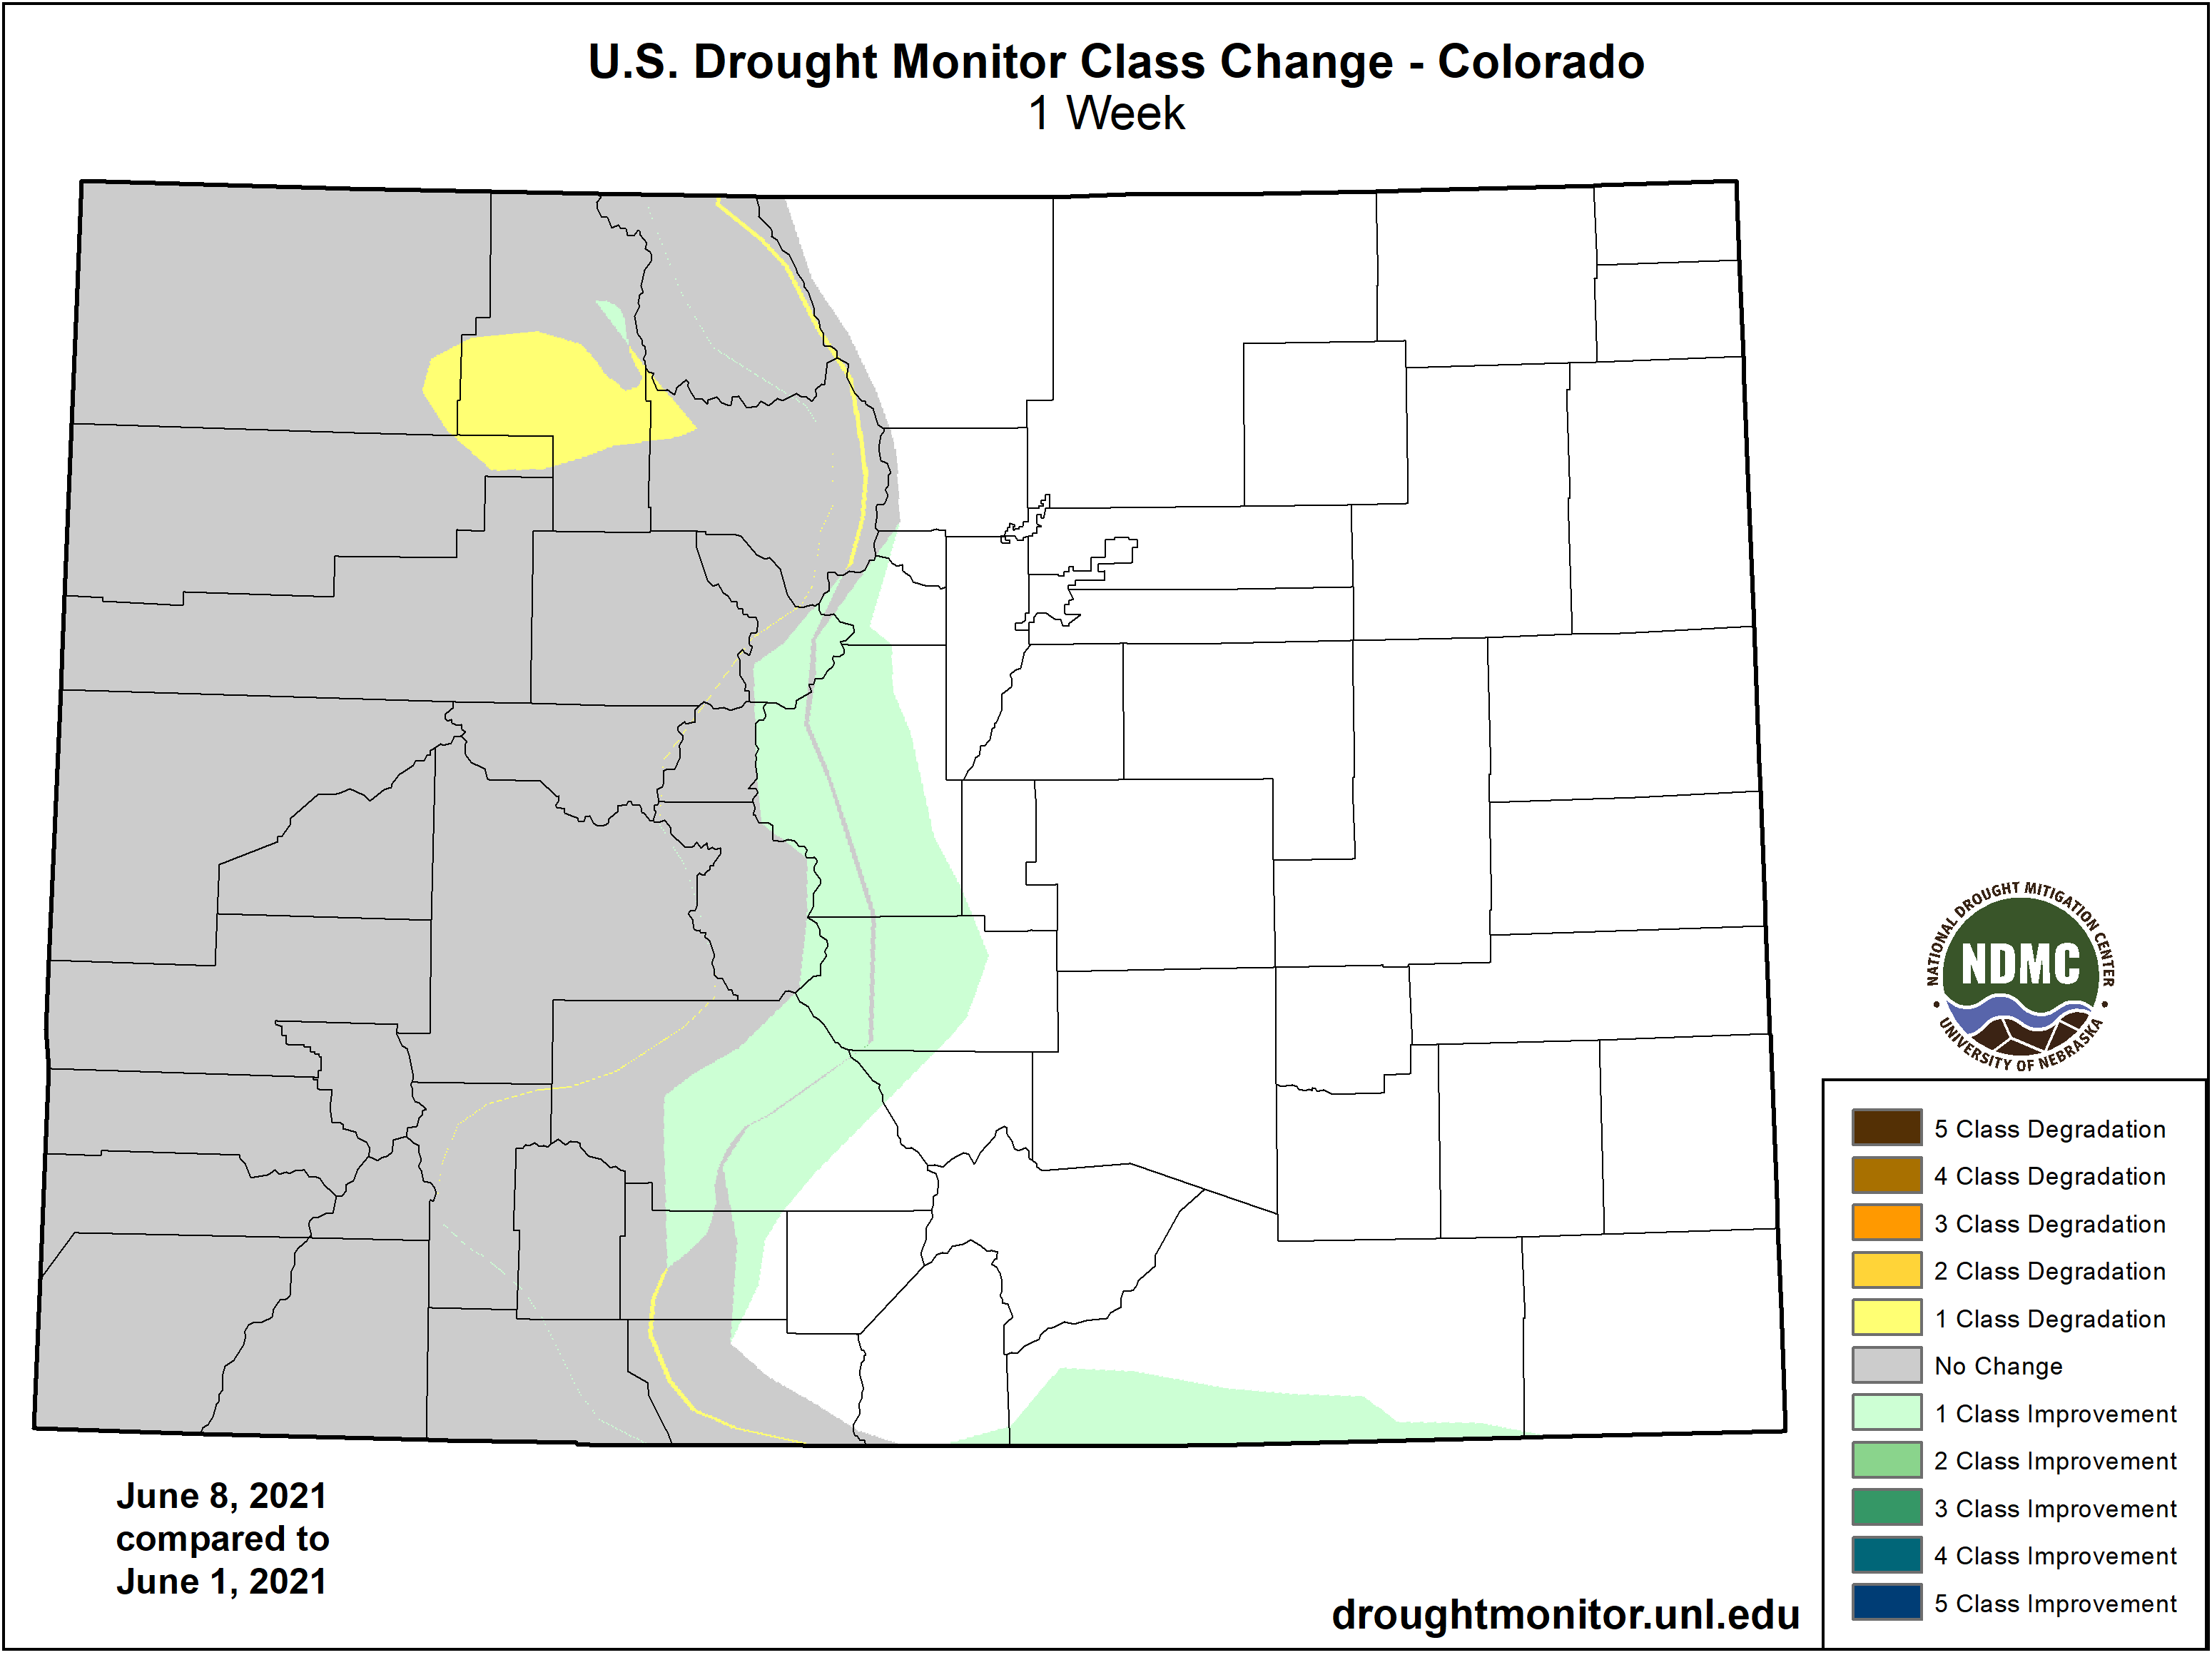 MAP Drought change between June 1 and June 8, 2021 - NDMC